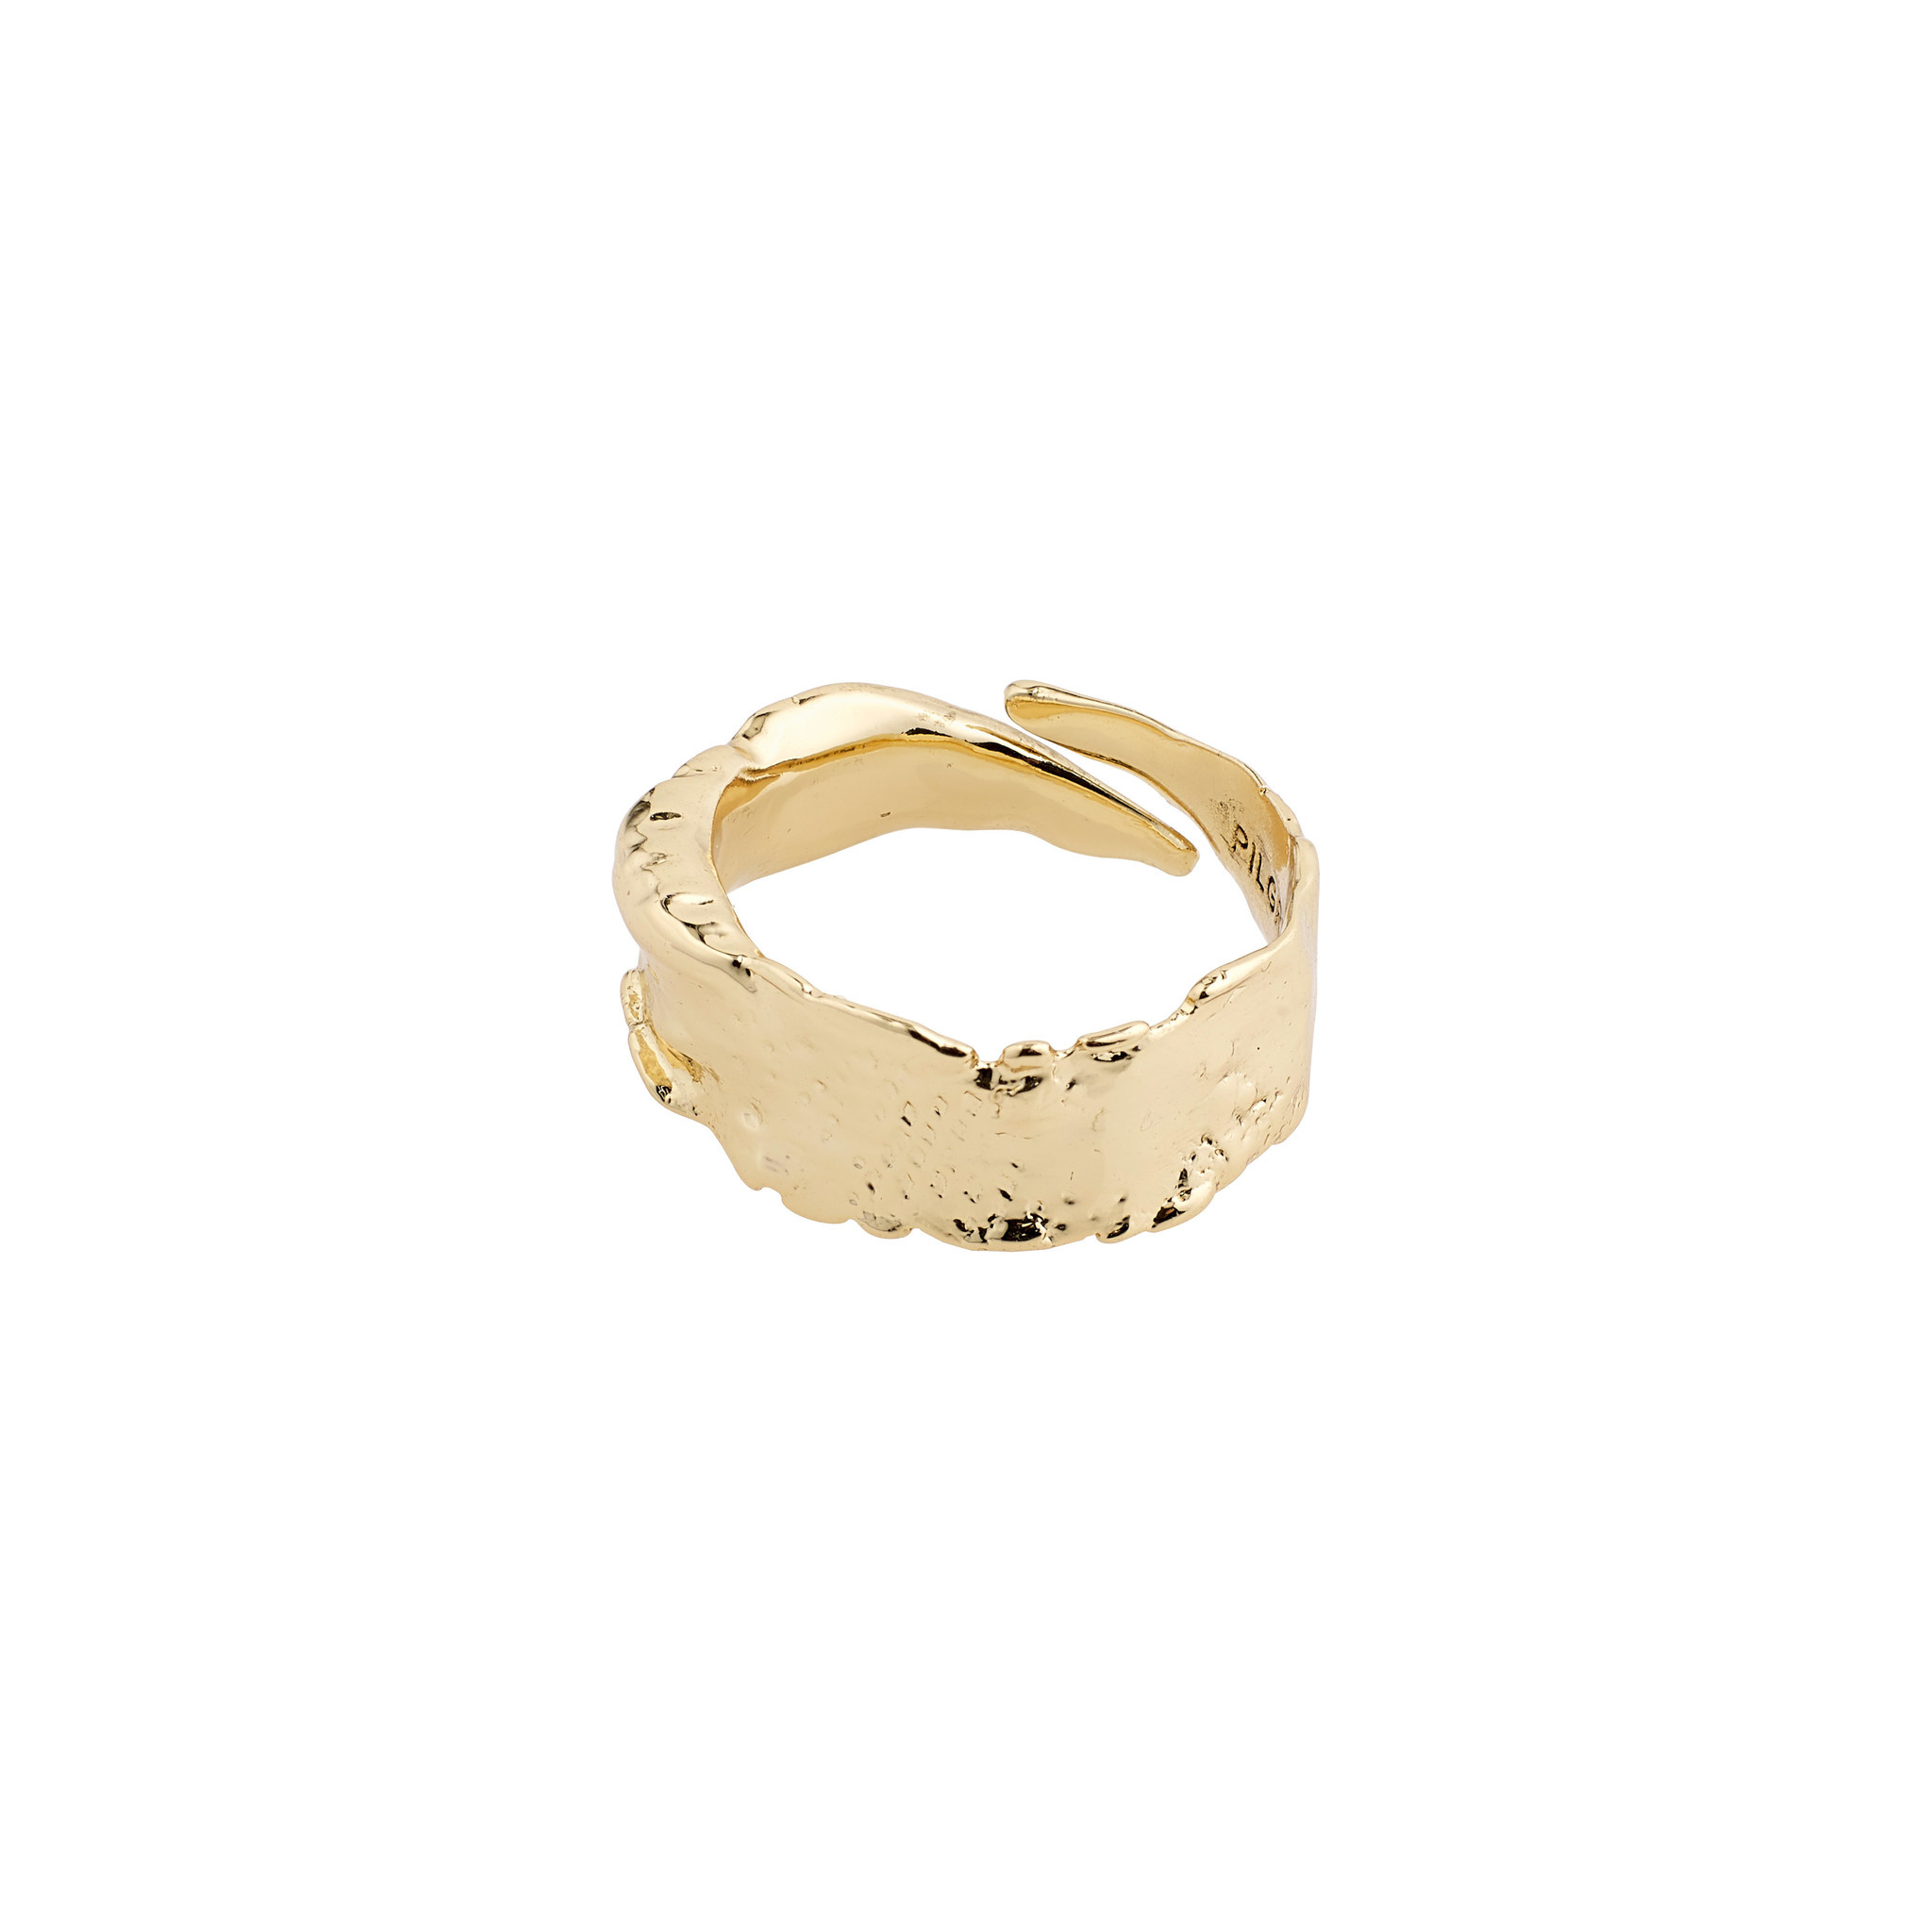 Pilgrim Ring Bathilda Gold Plated - 612112004